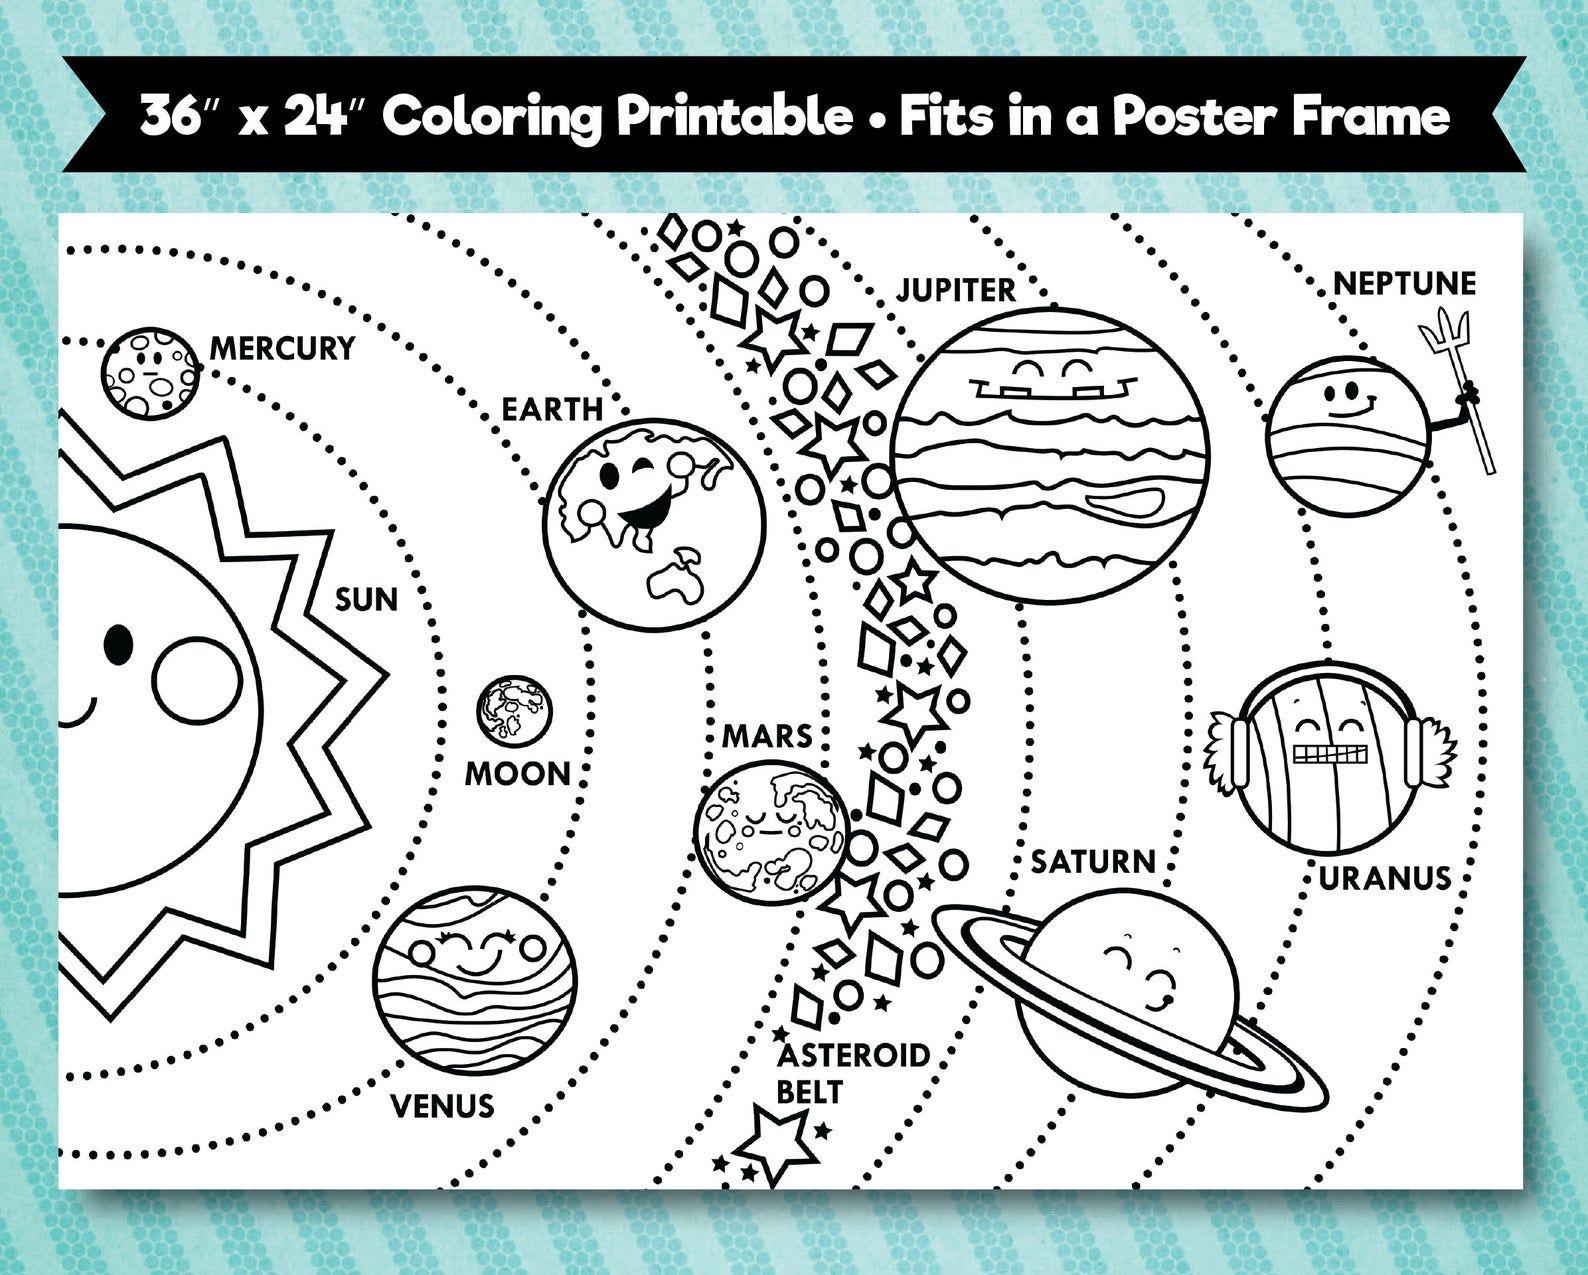 Solar System Printable 36x24 Horizontal Layout